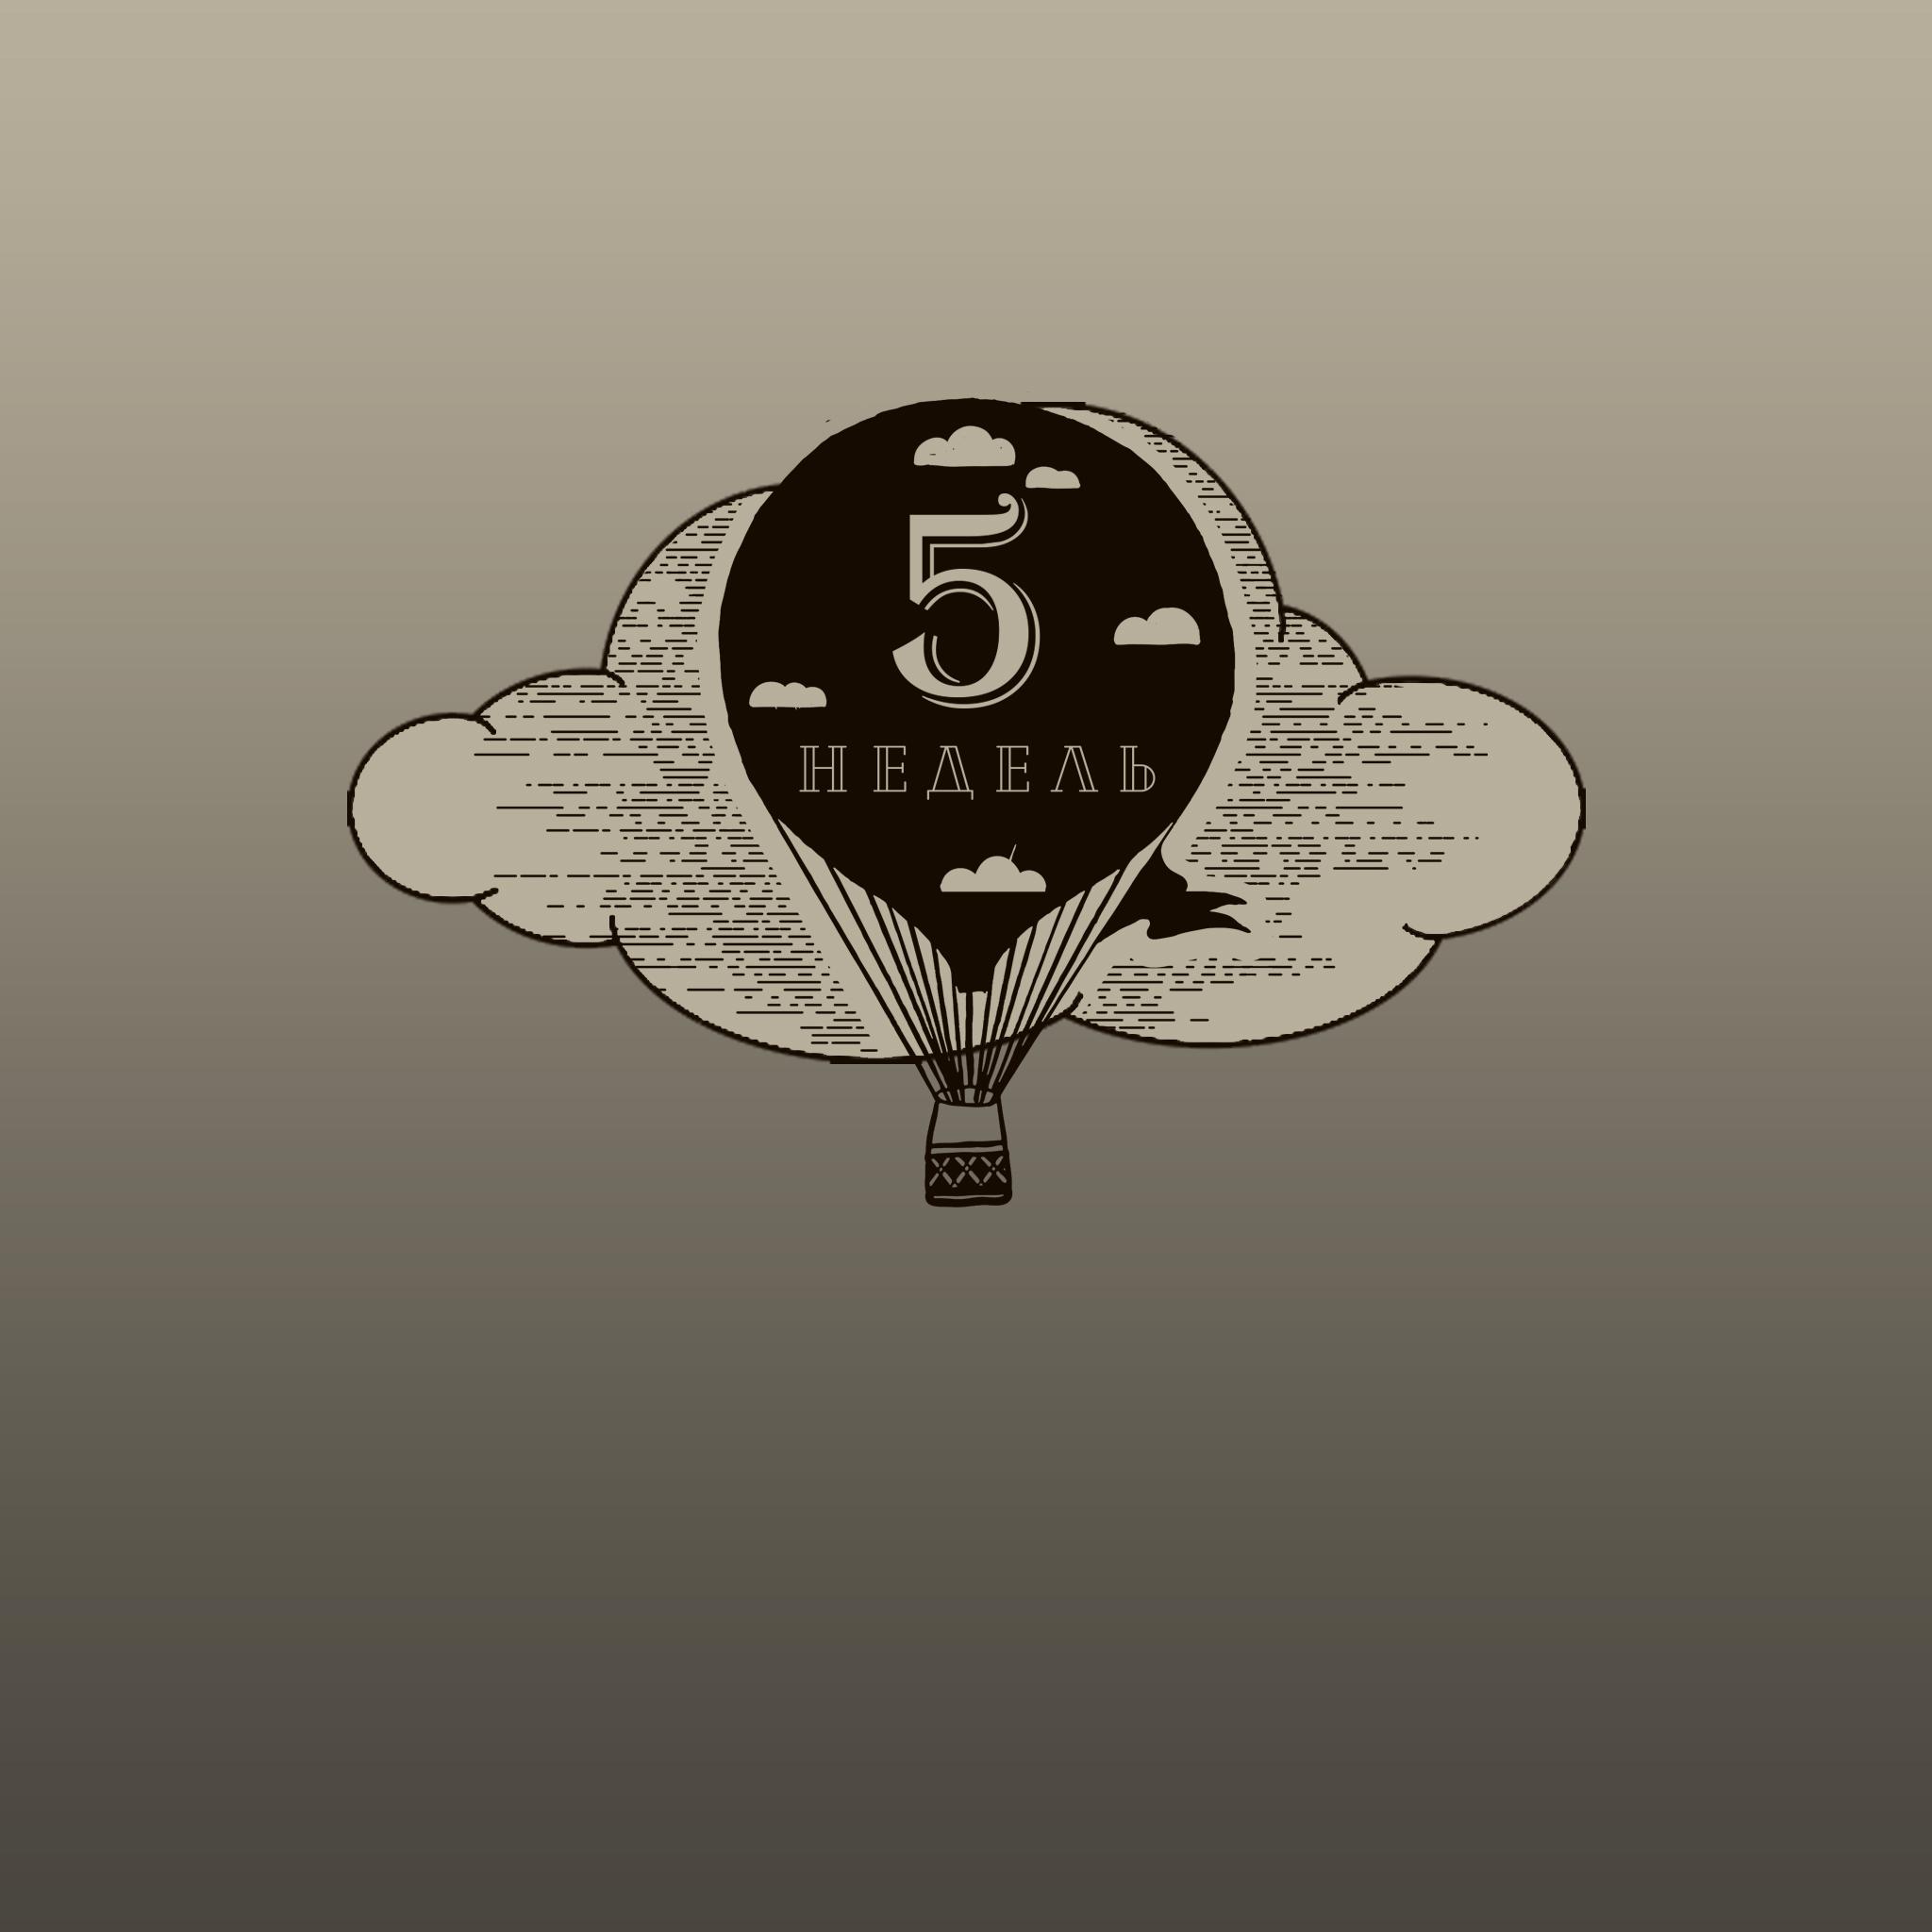 Логотип для кафе фото f_44259b2f762a9afe.jpg